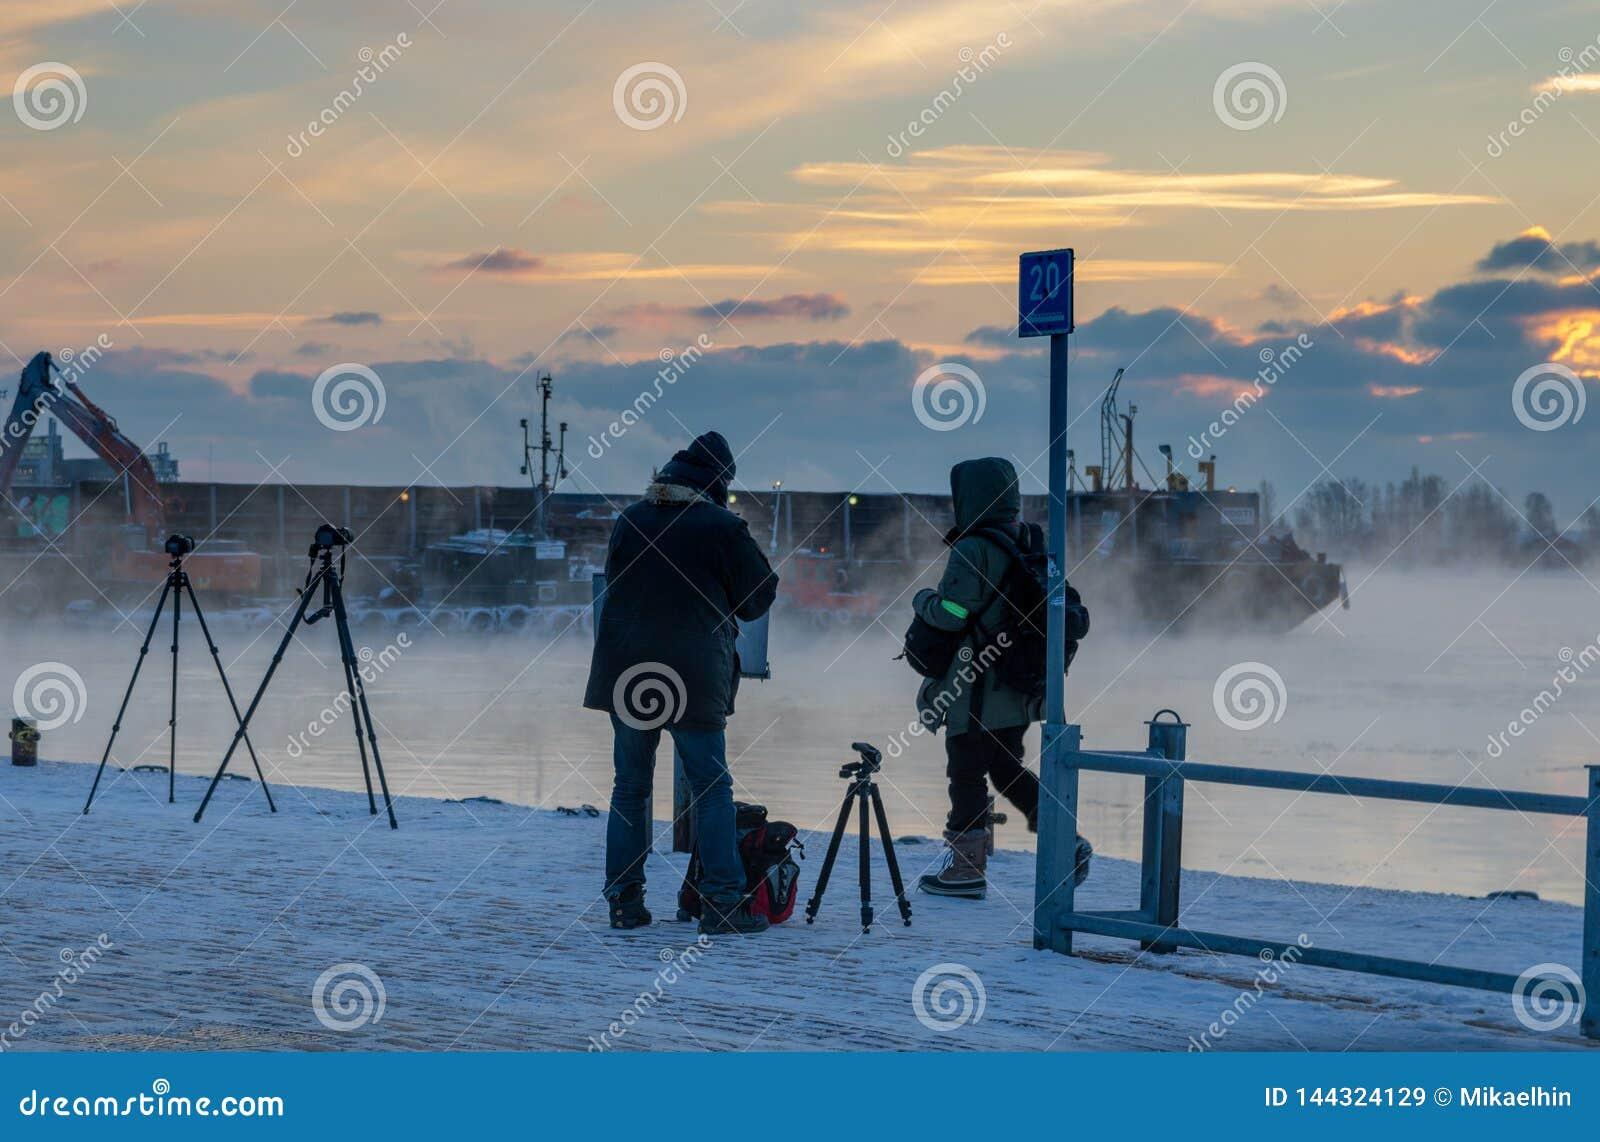 HELSINKI, FINLAND - JANUARY 8, 2015: Freezing photographers at harbor in winter